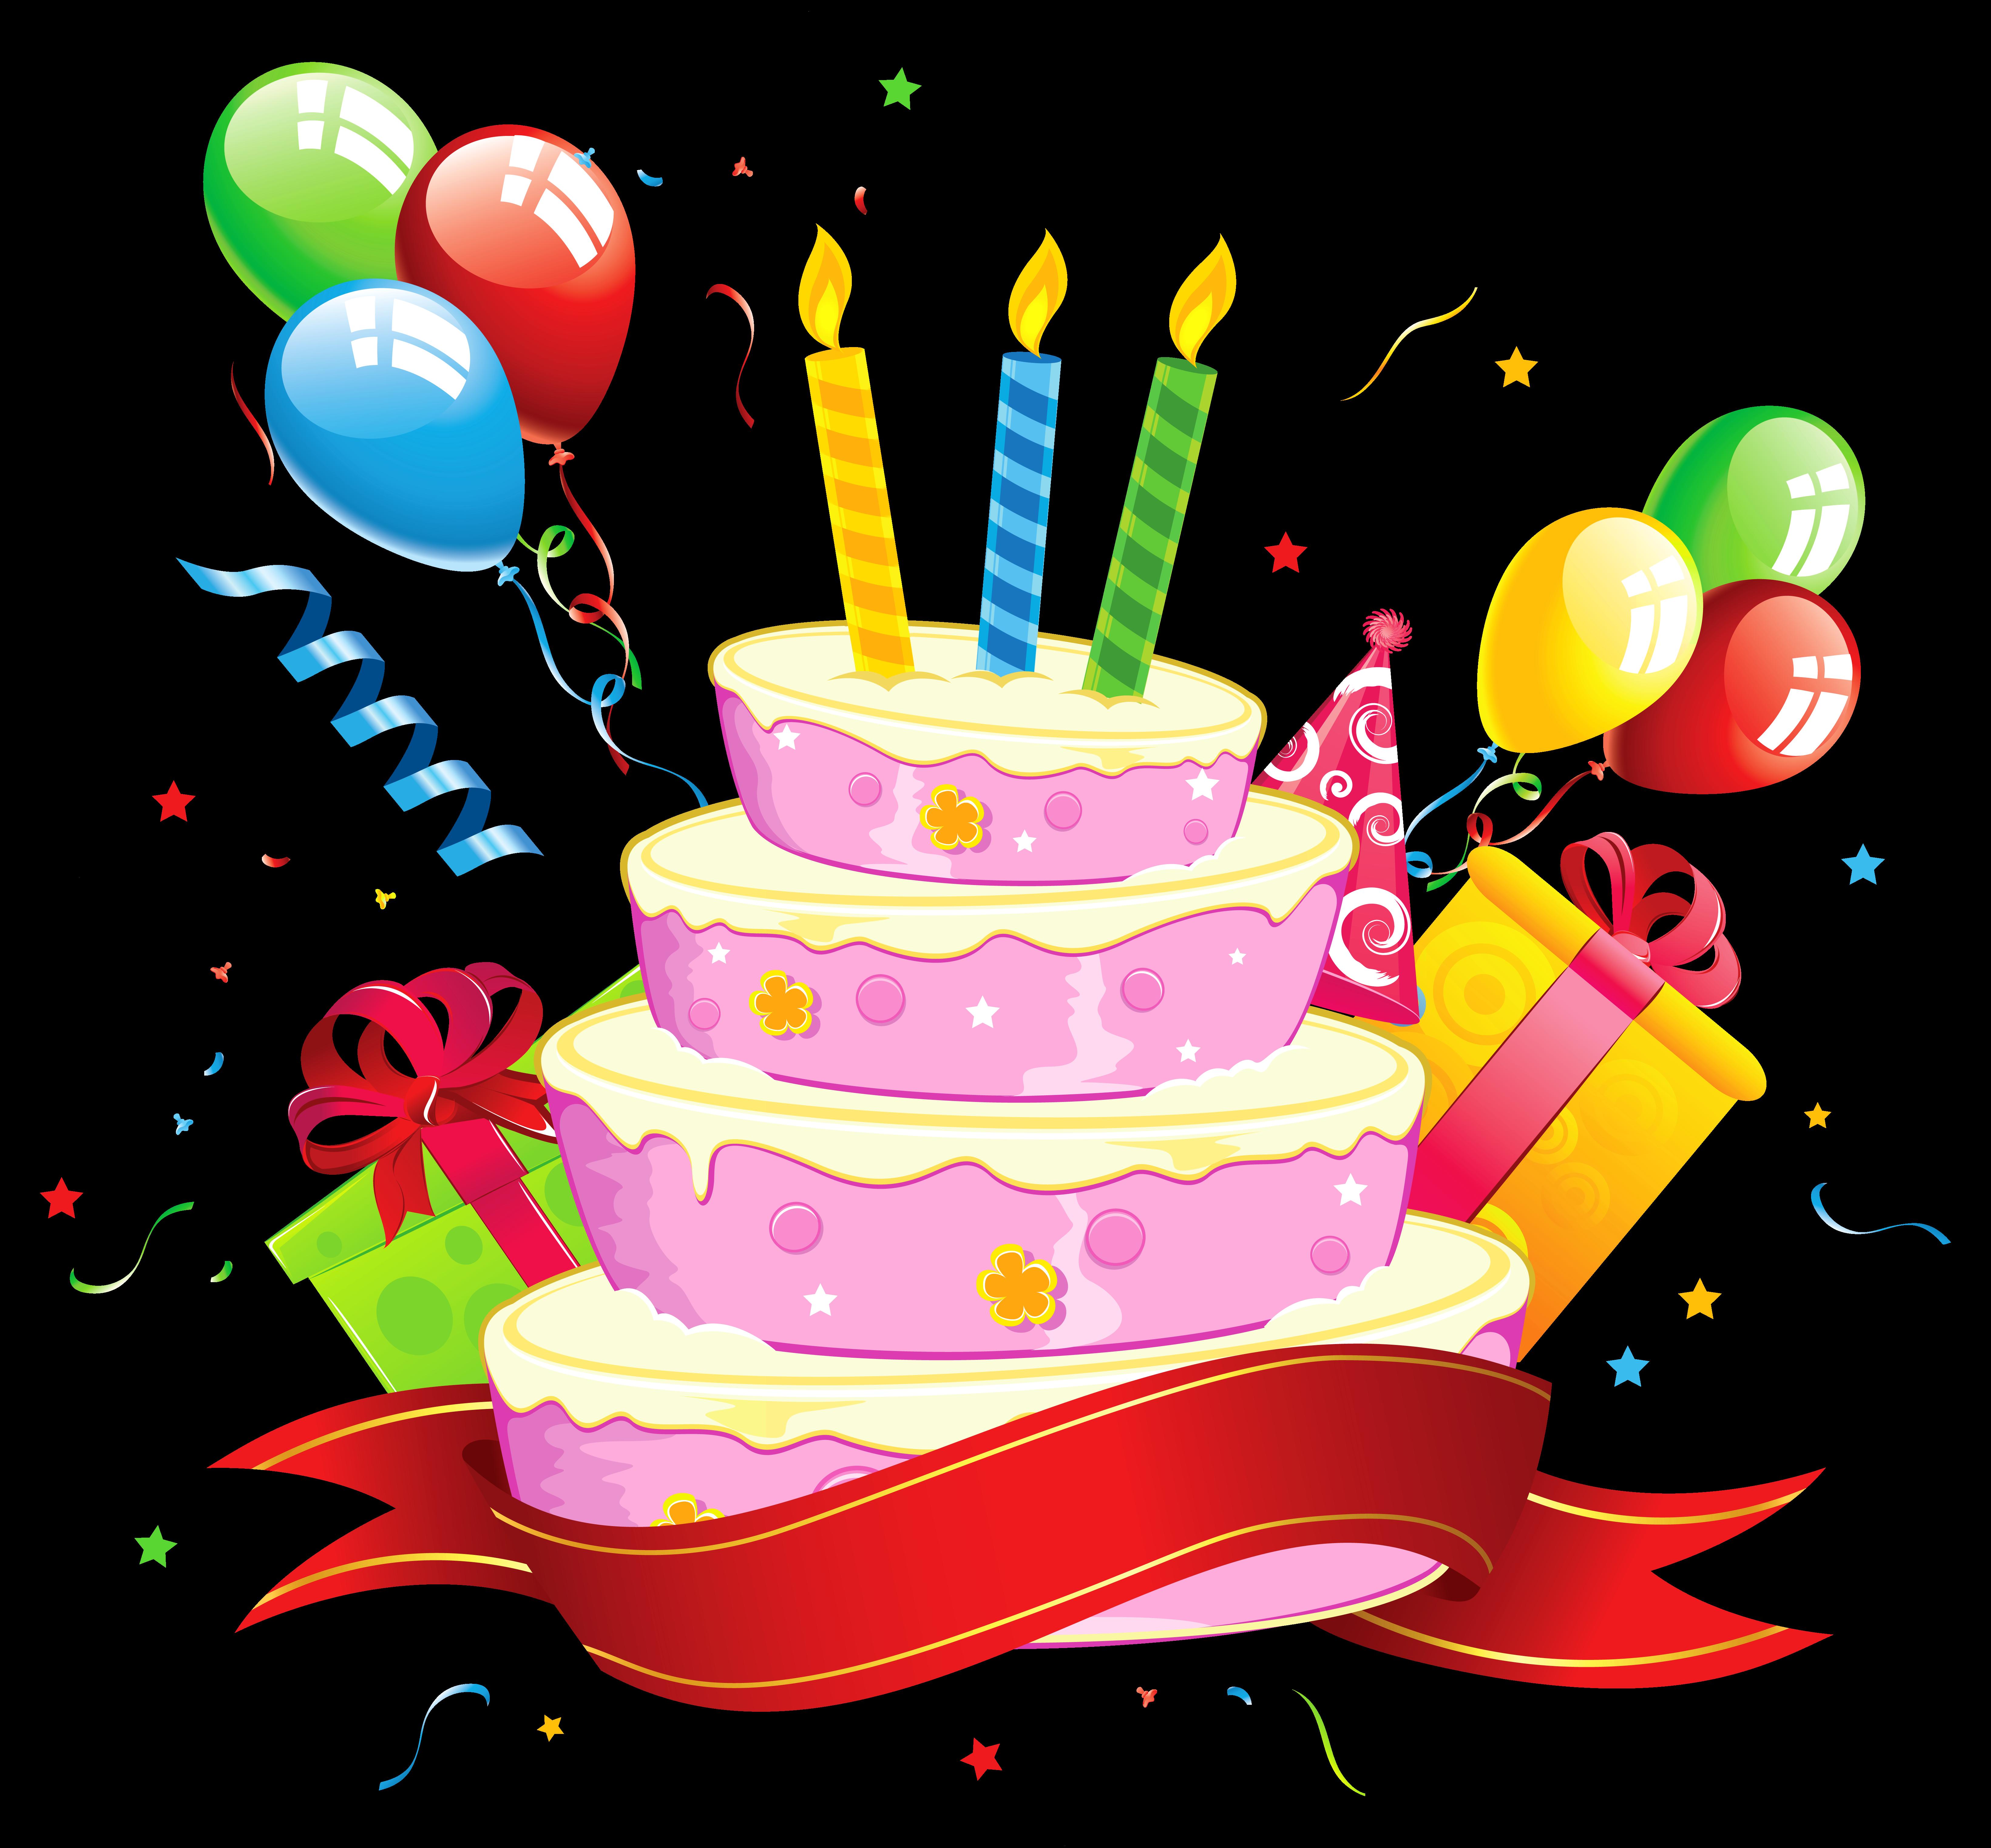 Cake party clip art. Donut clipart birthday